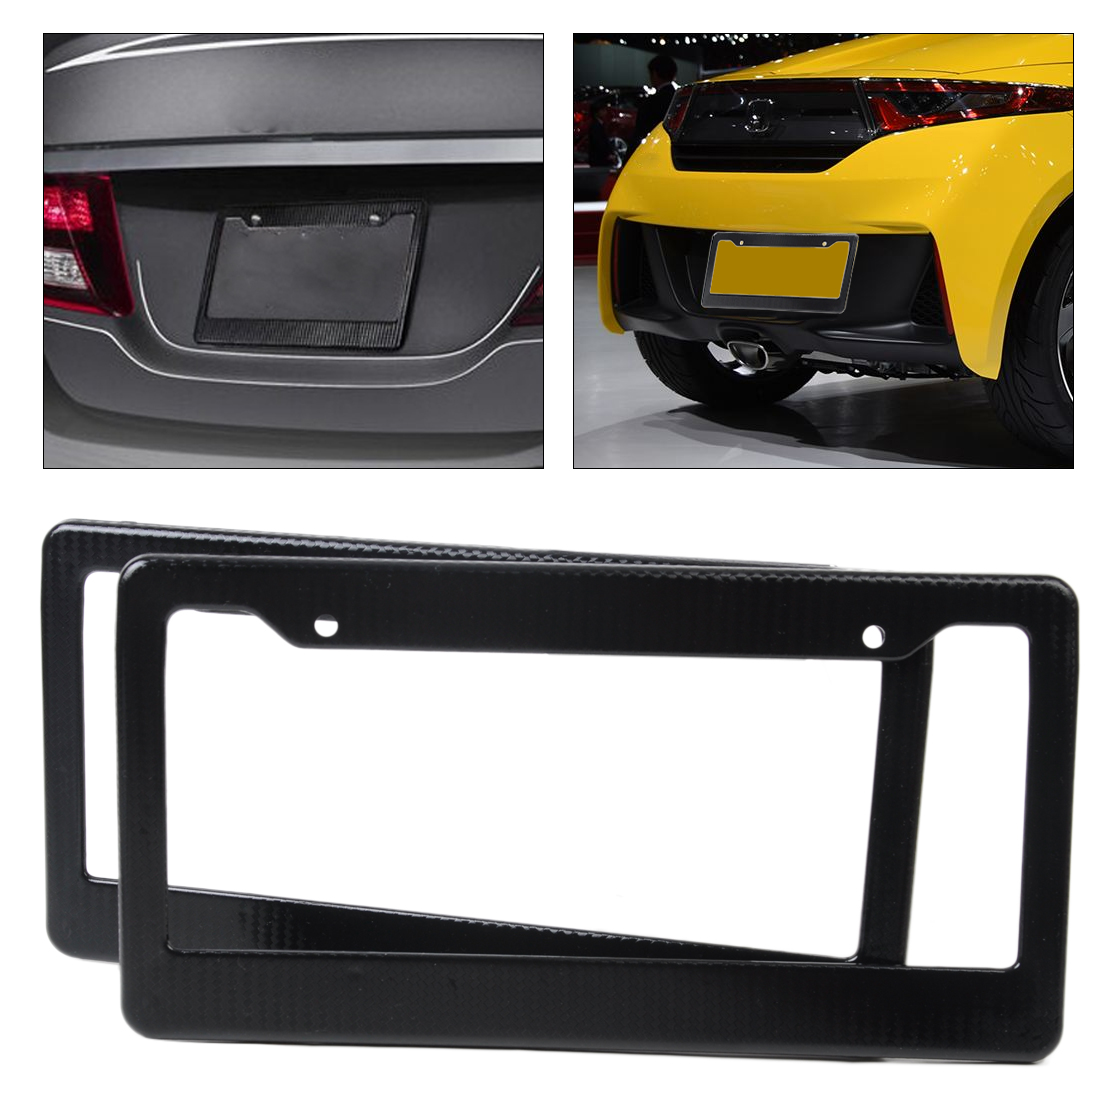 For Malibu Black Carbon Fiber Look Painted License Plate Frame x 2